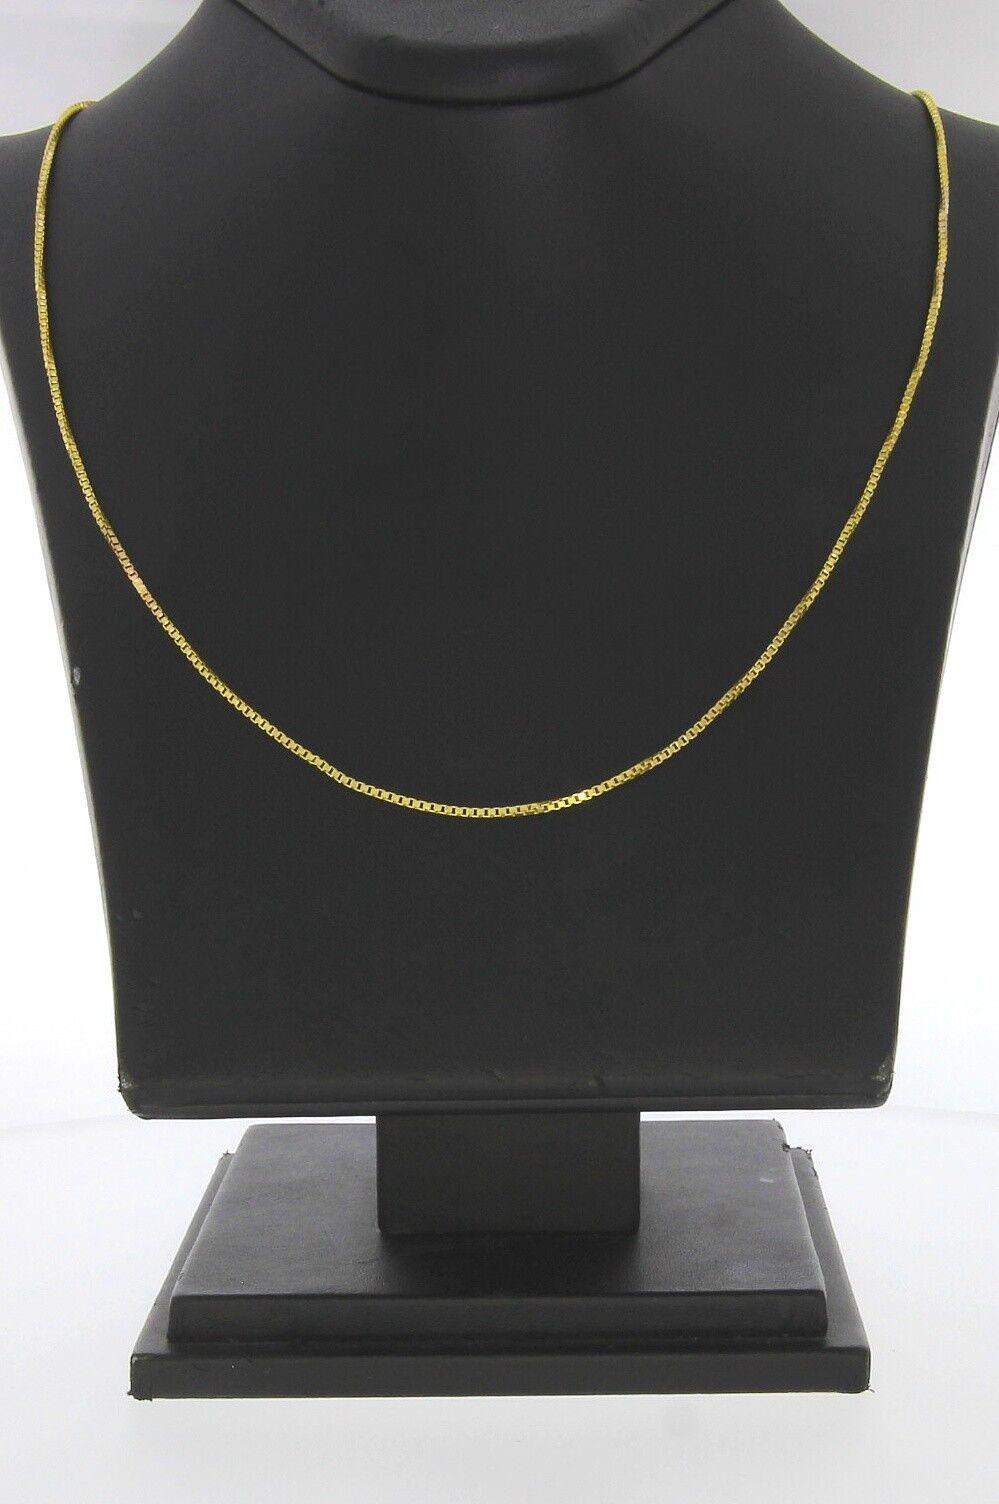 9676-333er yellowgold Kette Lang 56 cm Breit 1,31 mm Gewicht 4,1 Gramm